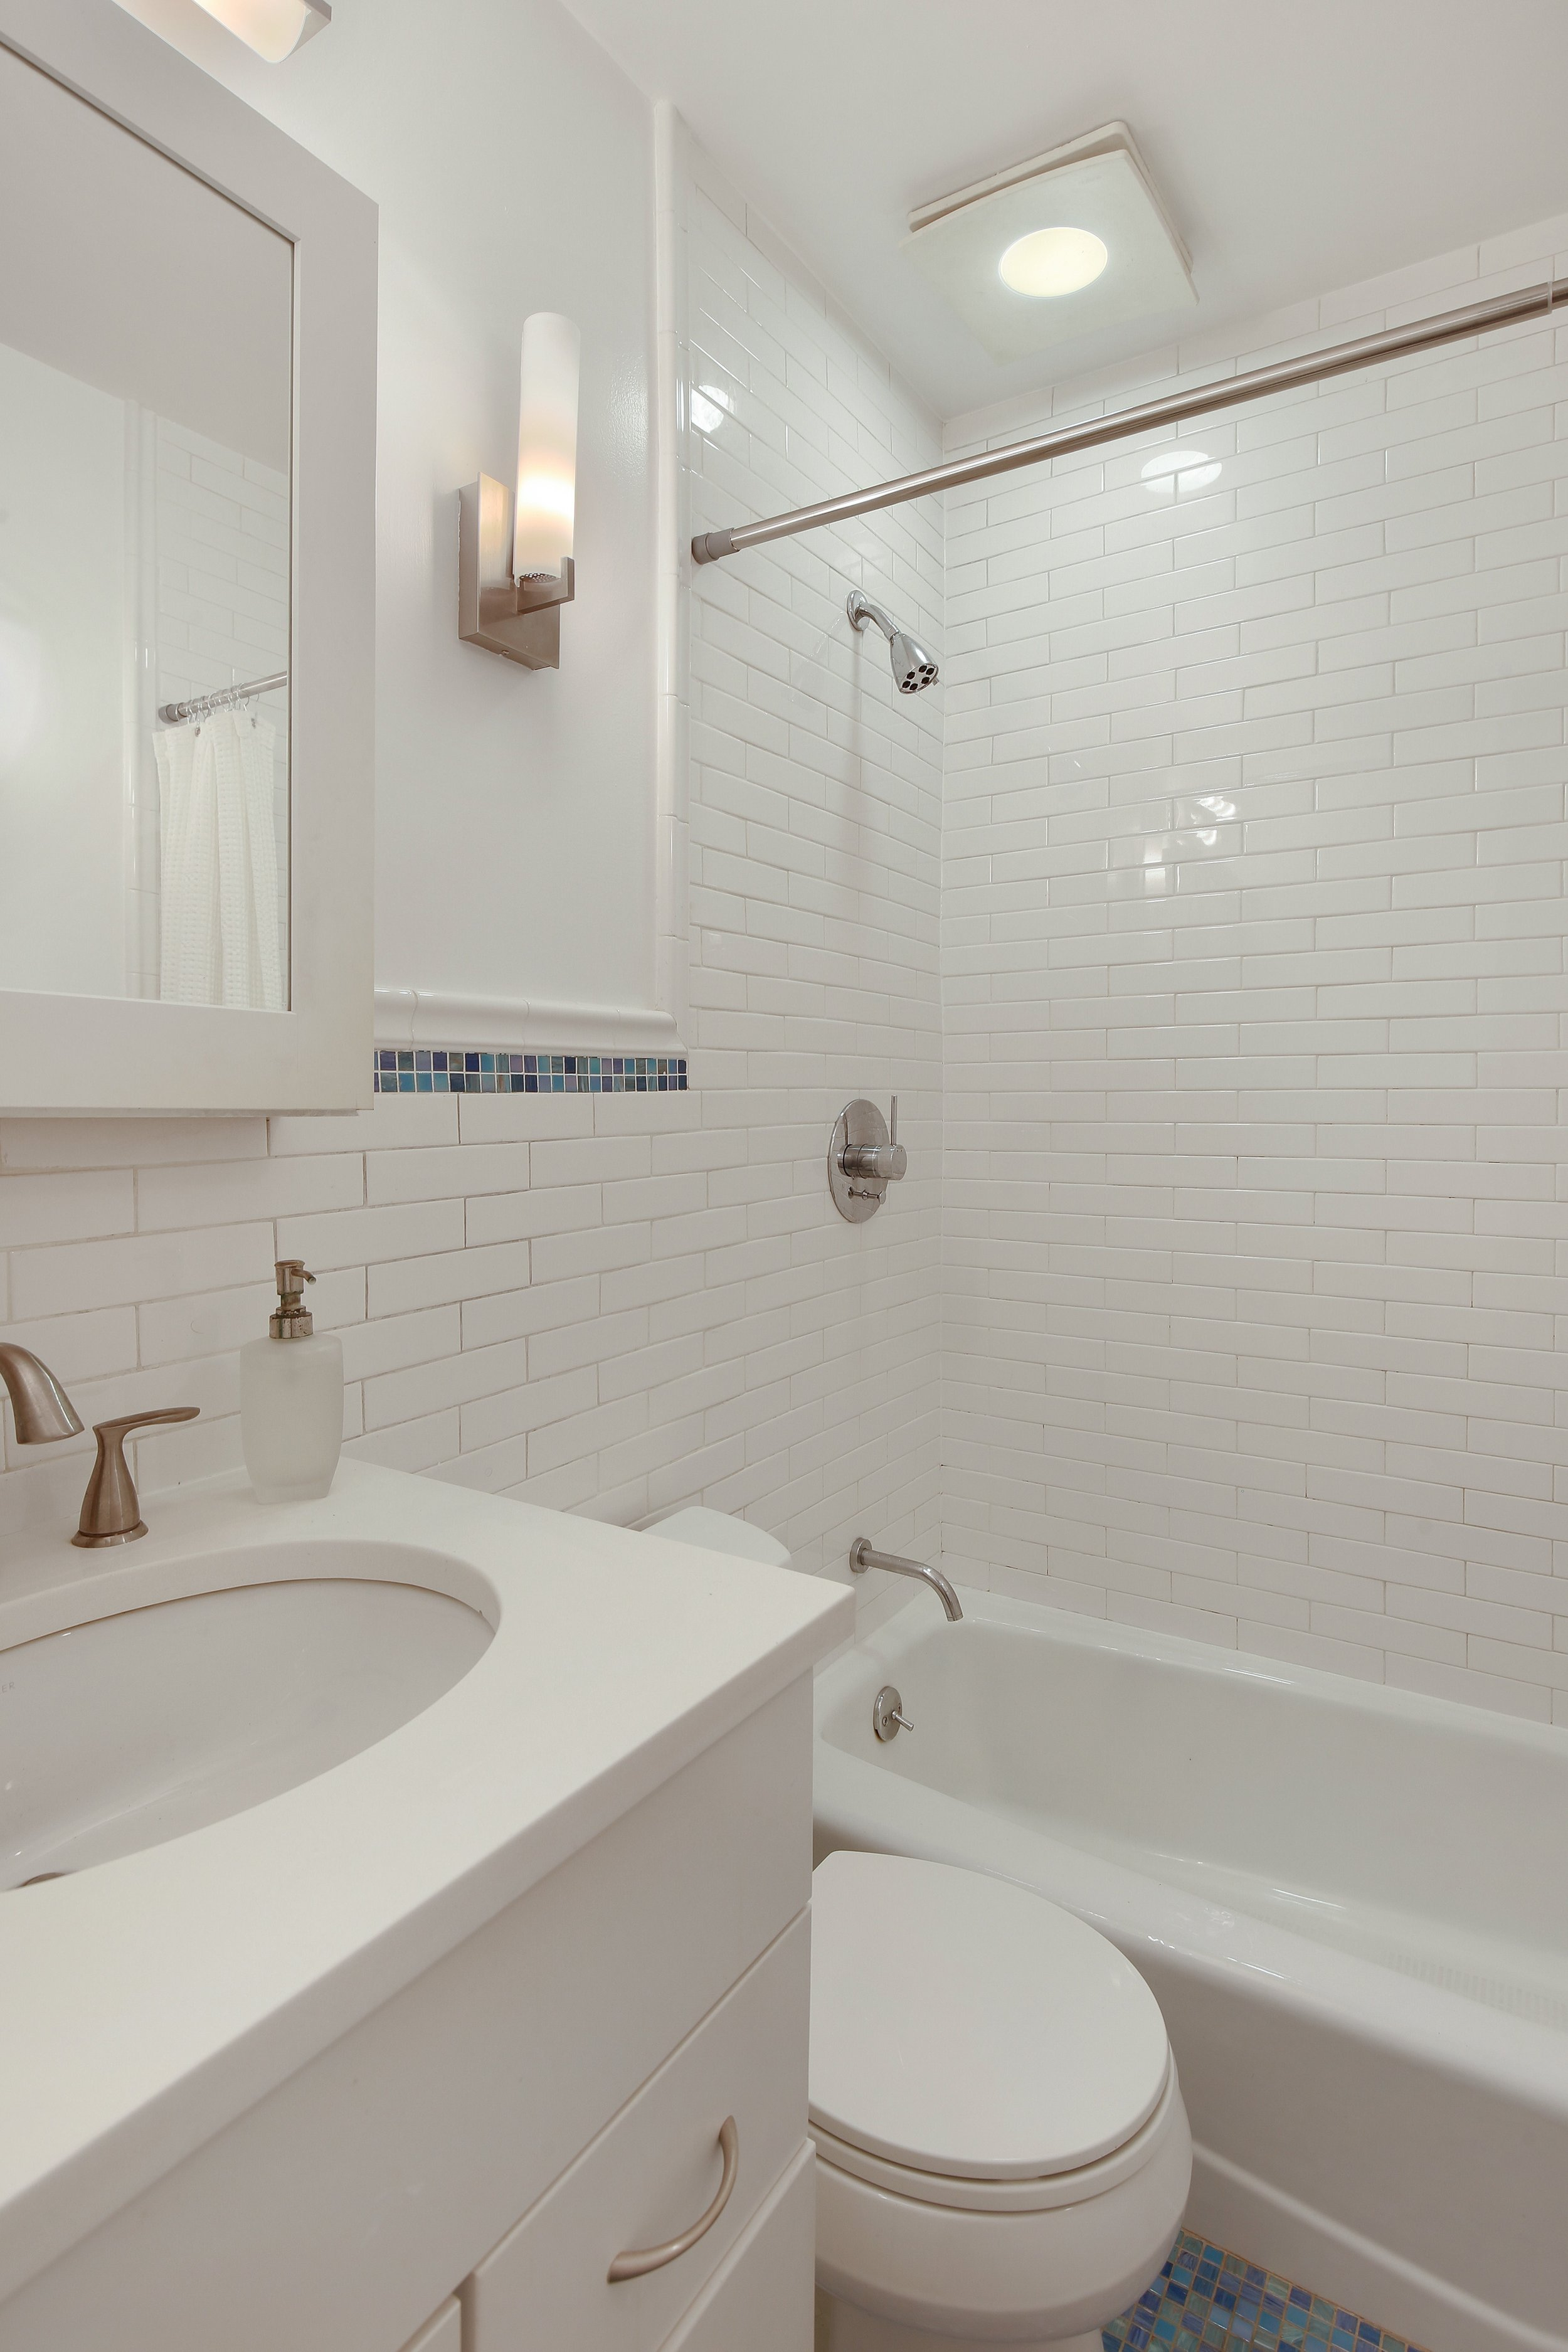 07_368AdelphiStreet_4_8_Bathroom_HiRes.jpg